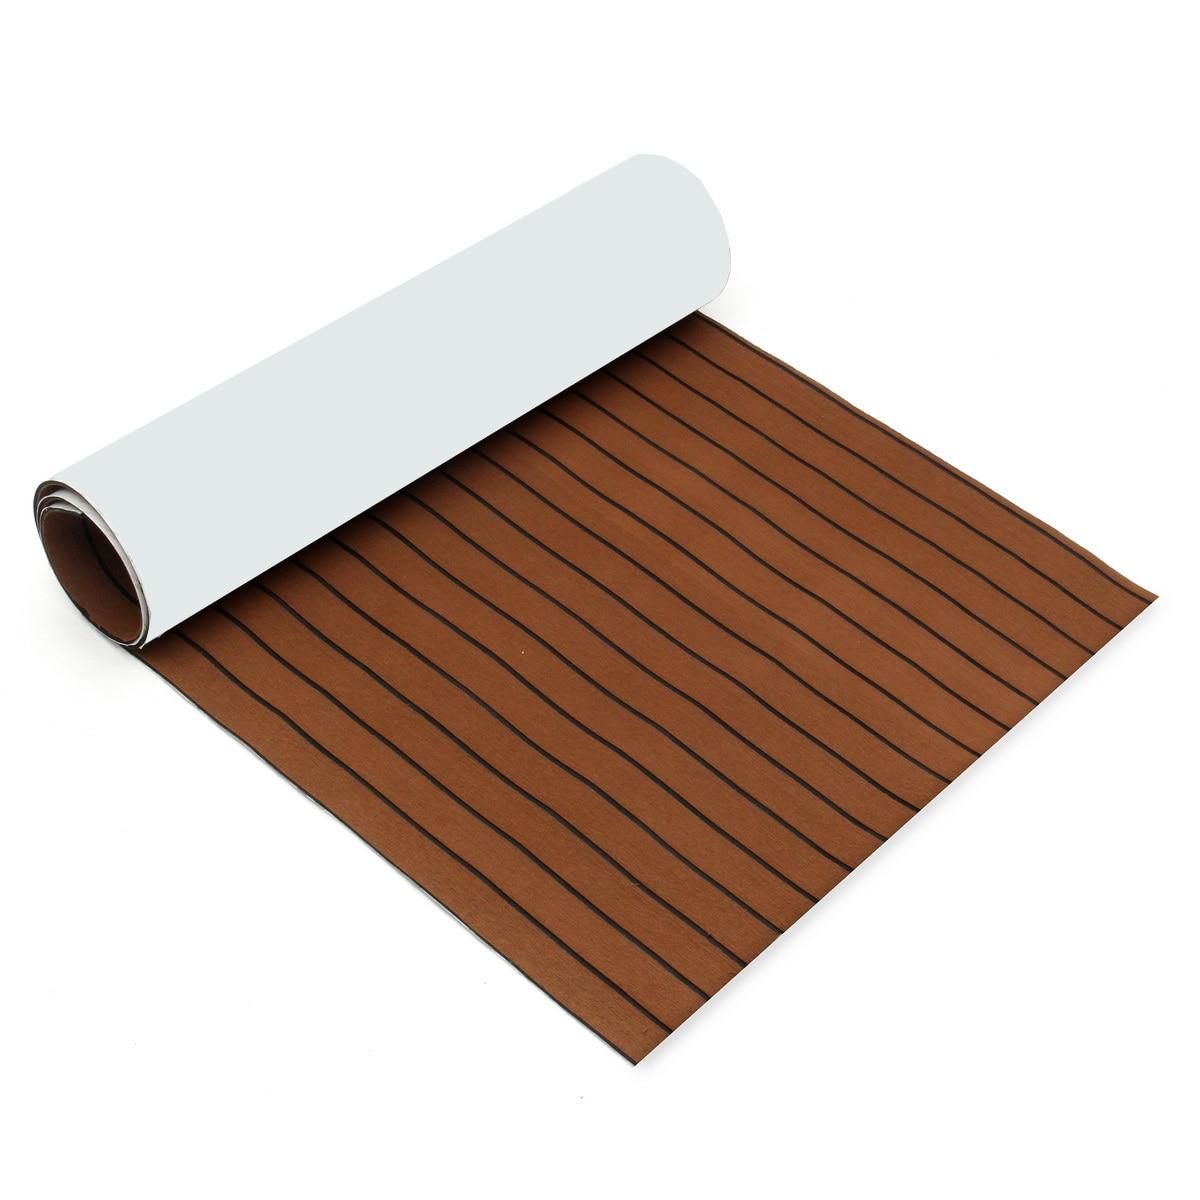 Foam Teak Decking Self-Adhesive 2500x1000x6mm EVA Foam Marine Flooring Faux Boat Decking Sheet Accessories Marine 3 Styles